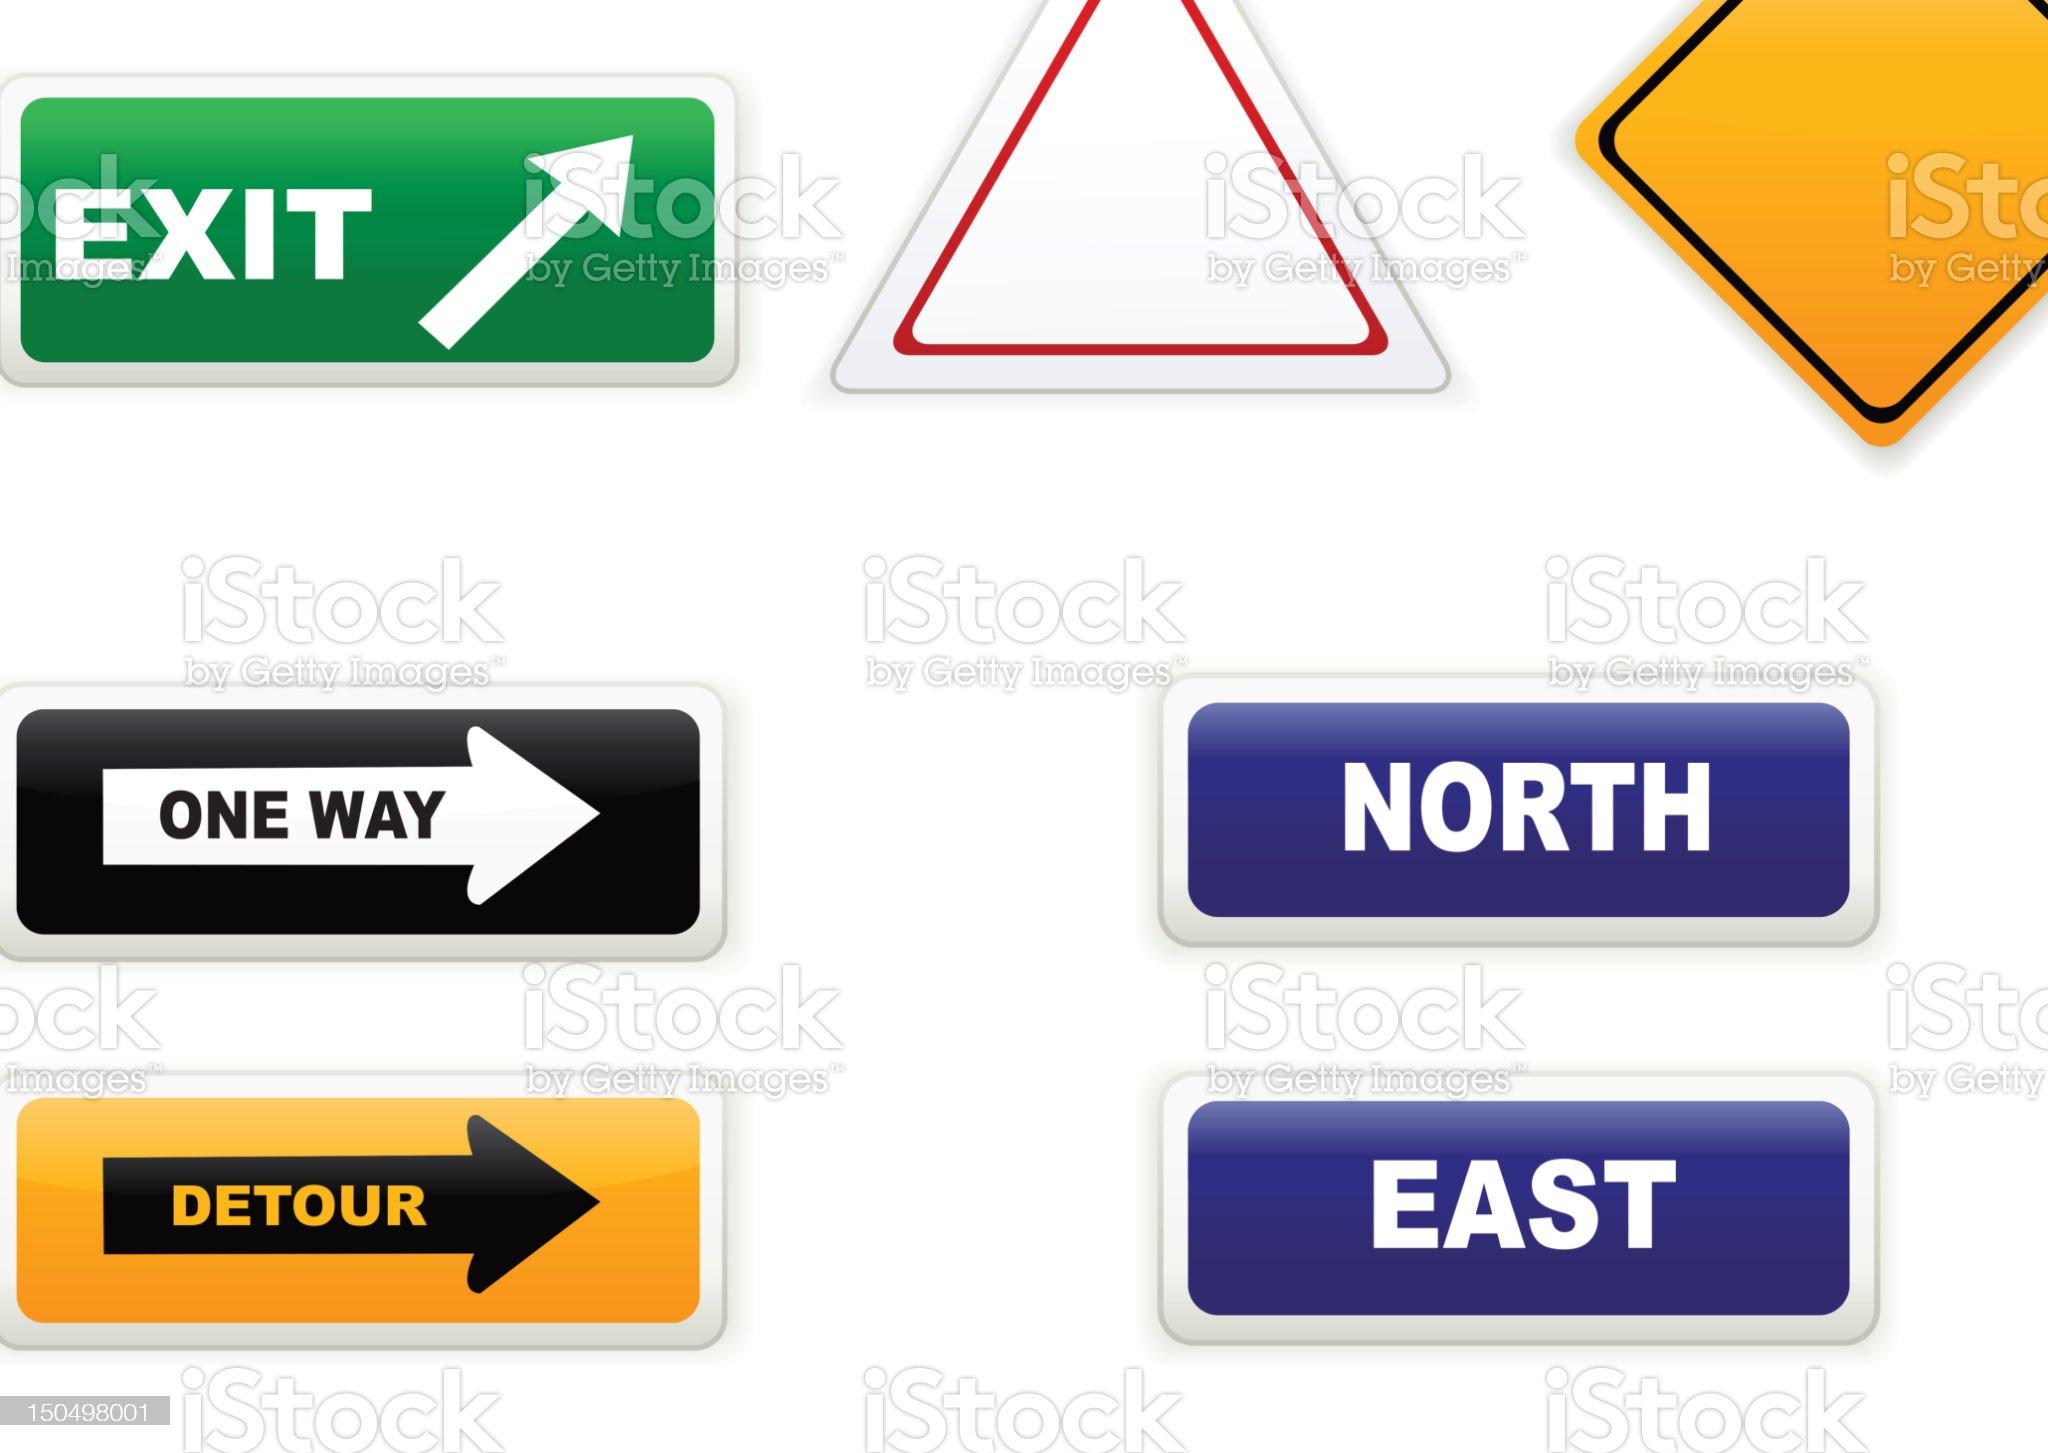 Several road warning hazard and direction signs royalty-free stock vector art